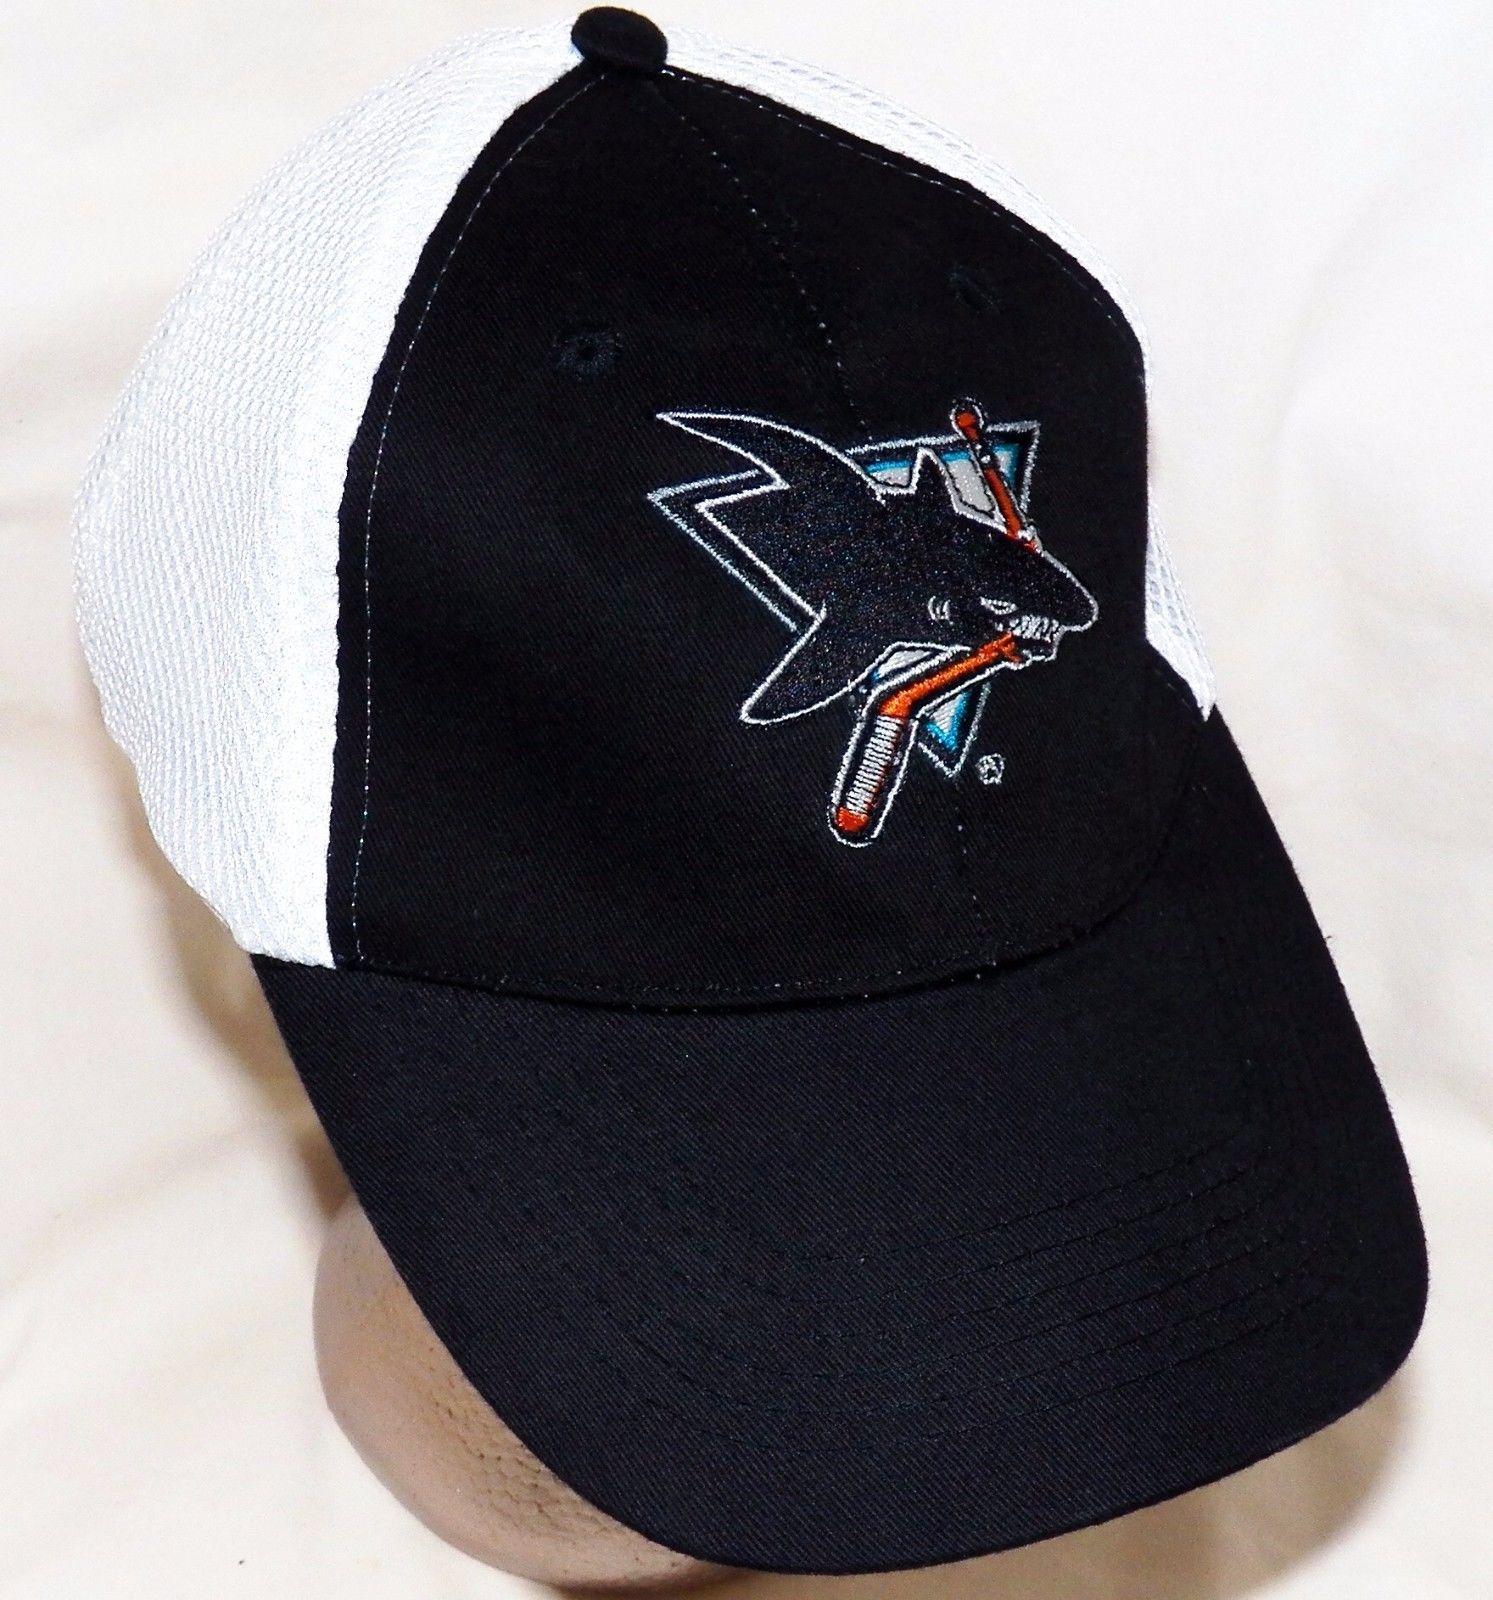 d3ac1704a00 Stanley Cup San Jose Sharks Signature Series and 50 similar items